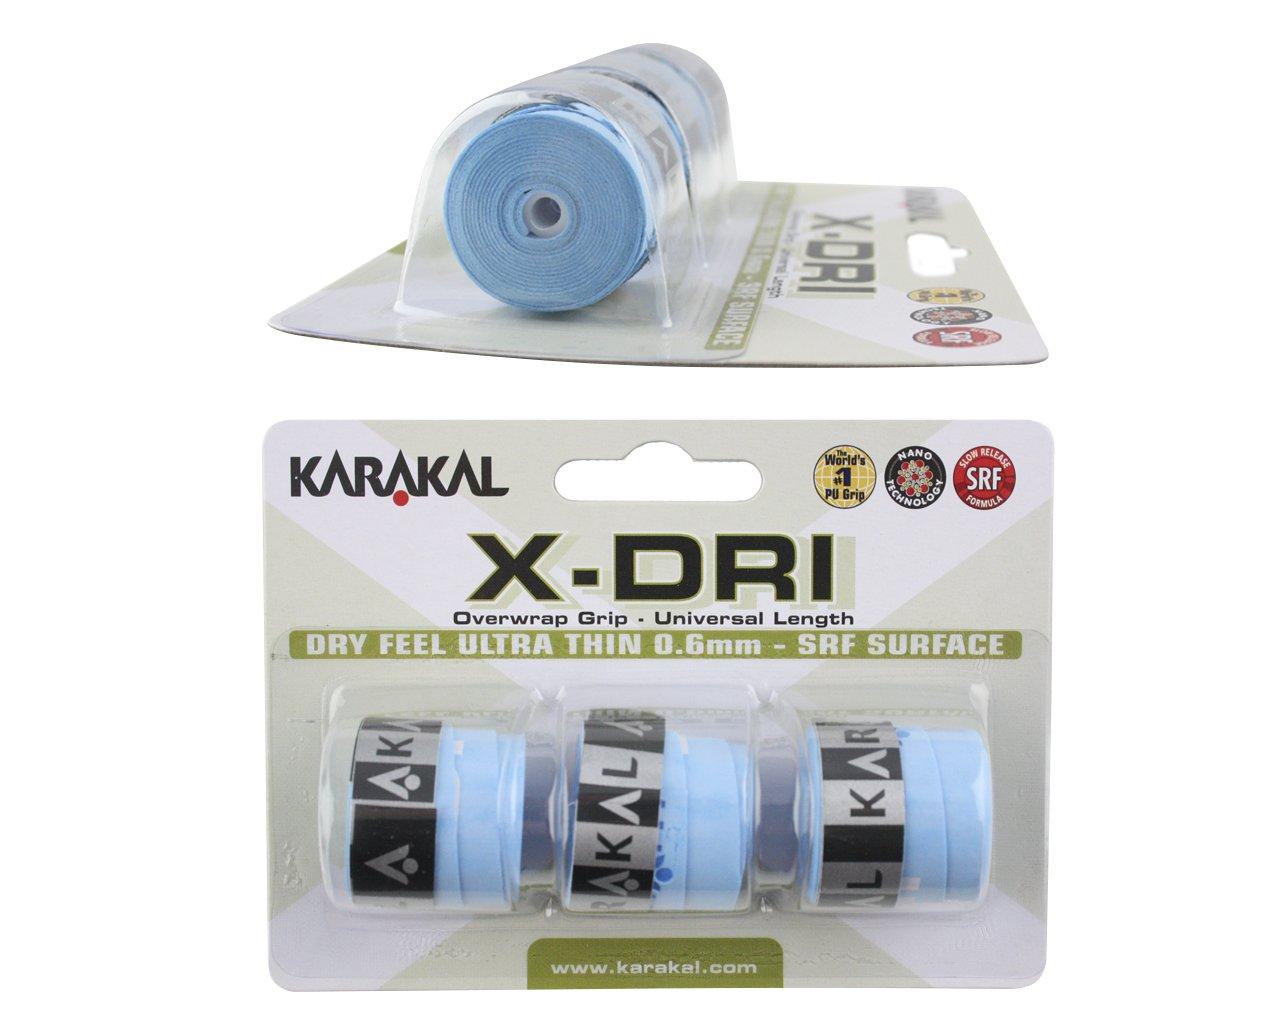 Karakal X-DRI Overgrips - Pack of 3 - Blue - Tennis - Squash - Badminton